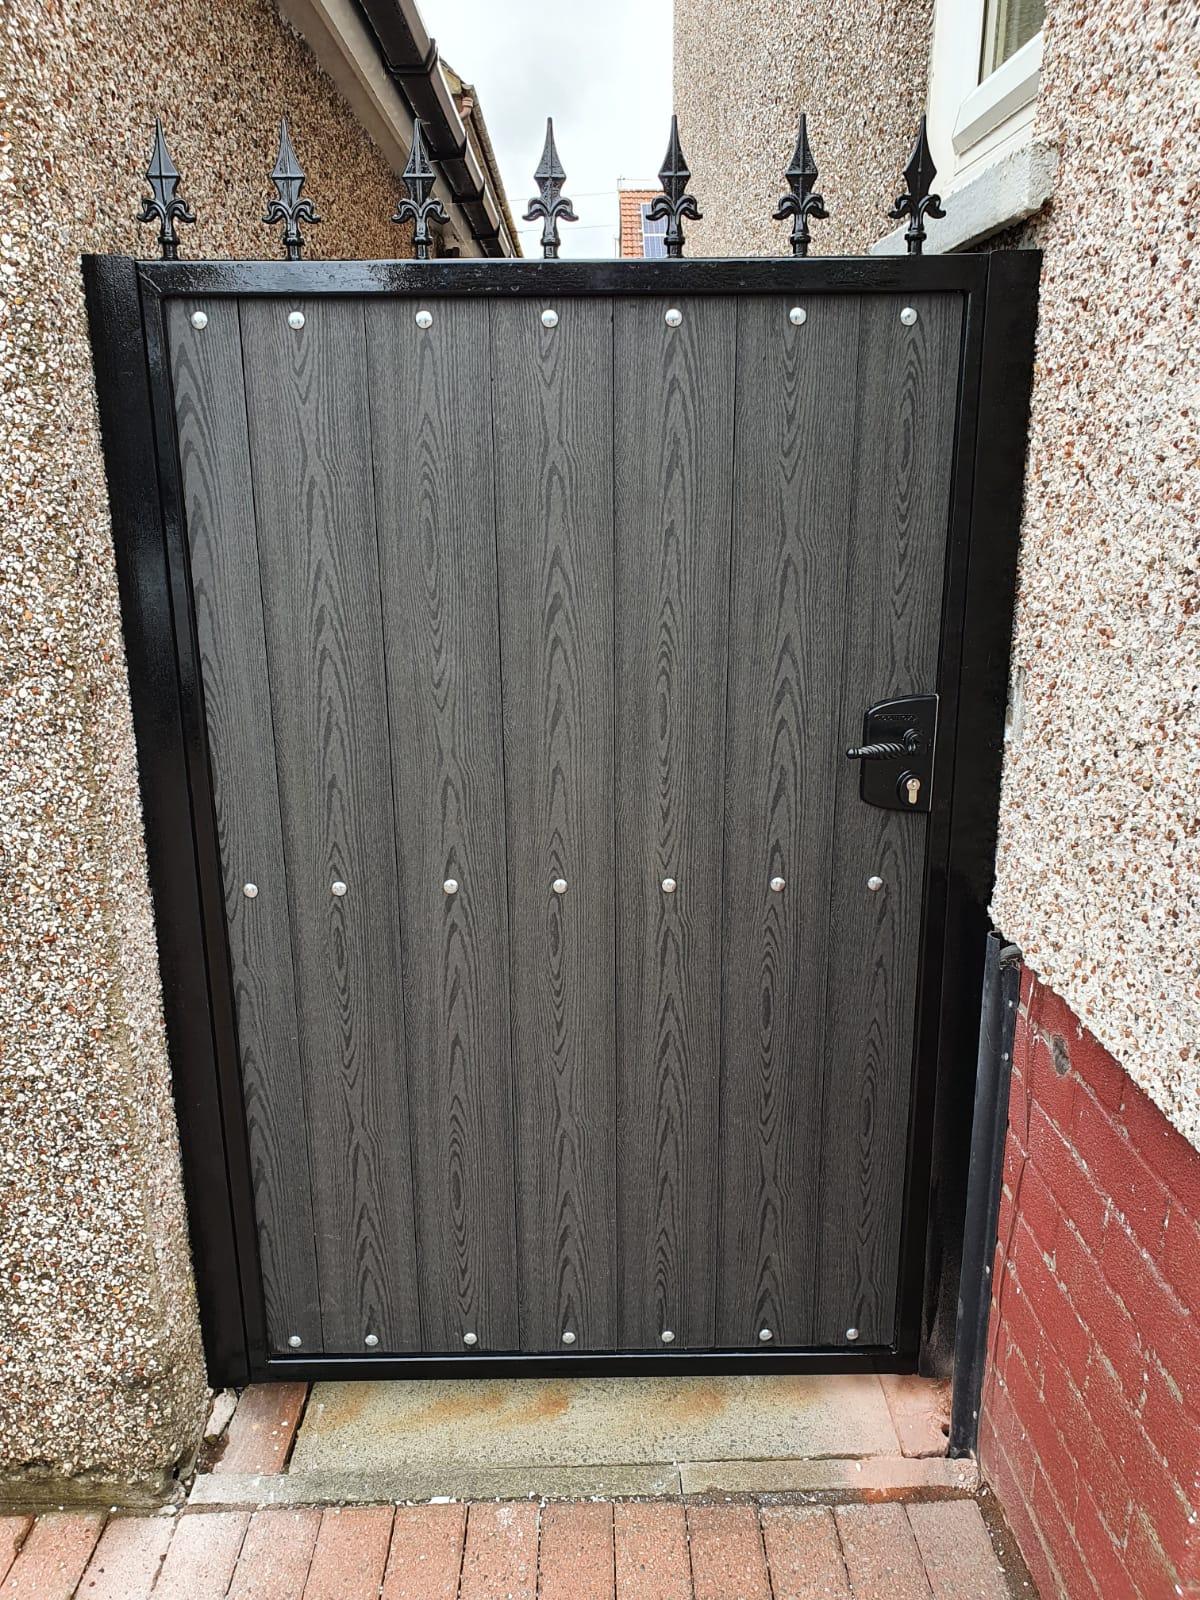 Composite side gate installed in Stewarton by Dain Art Iron